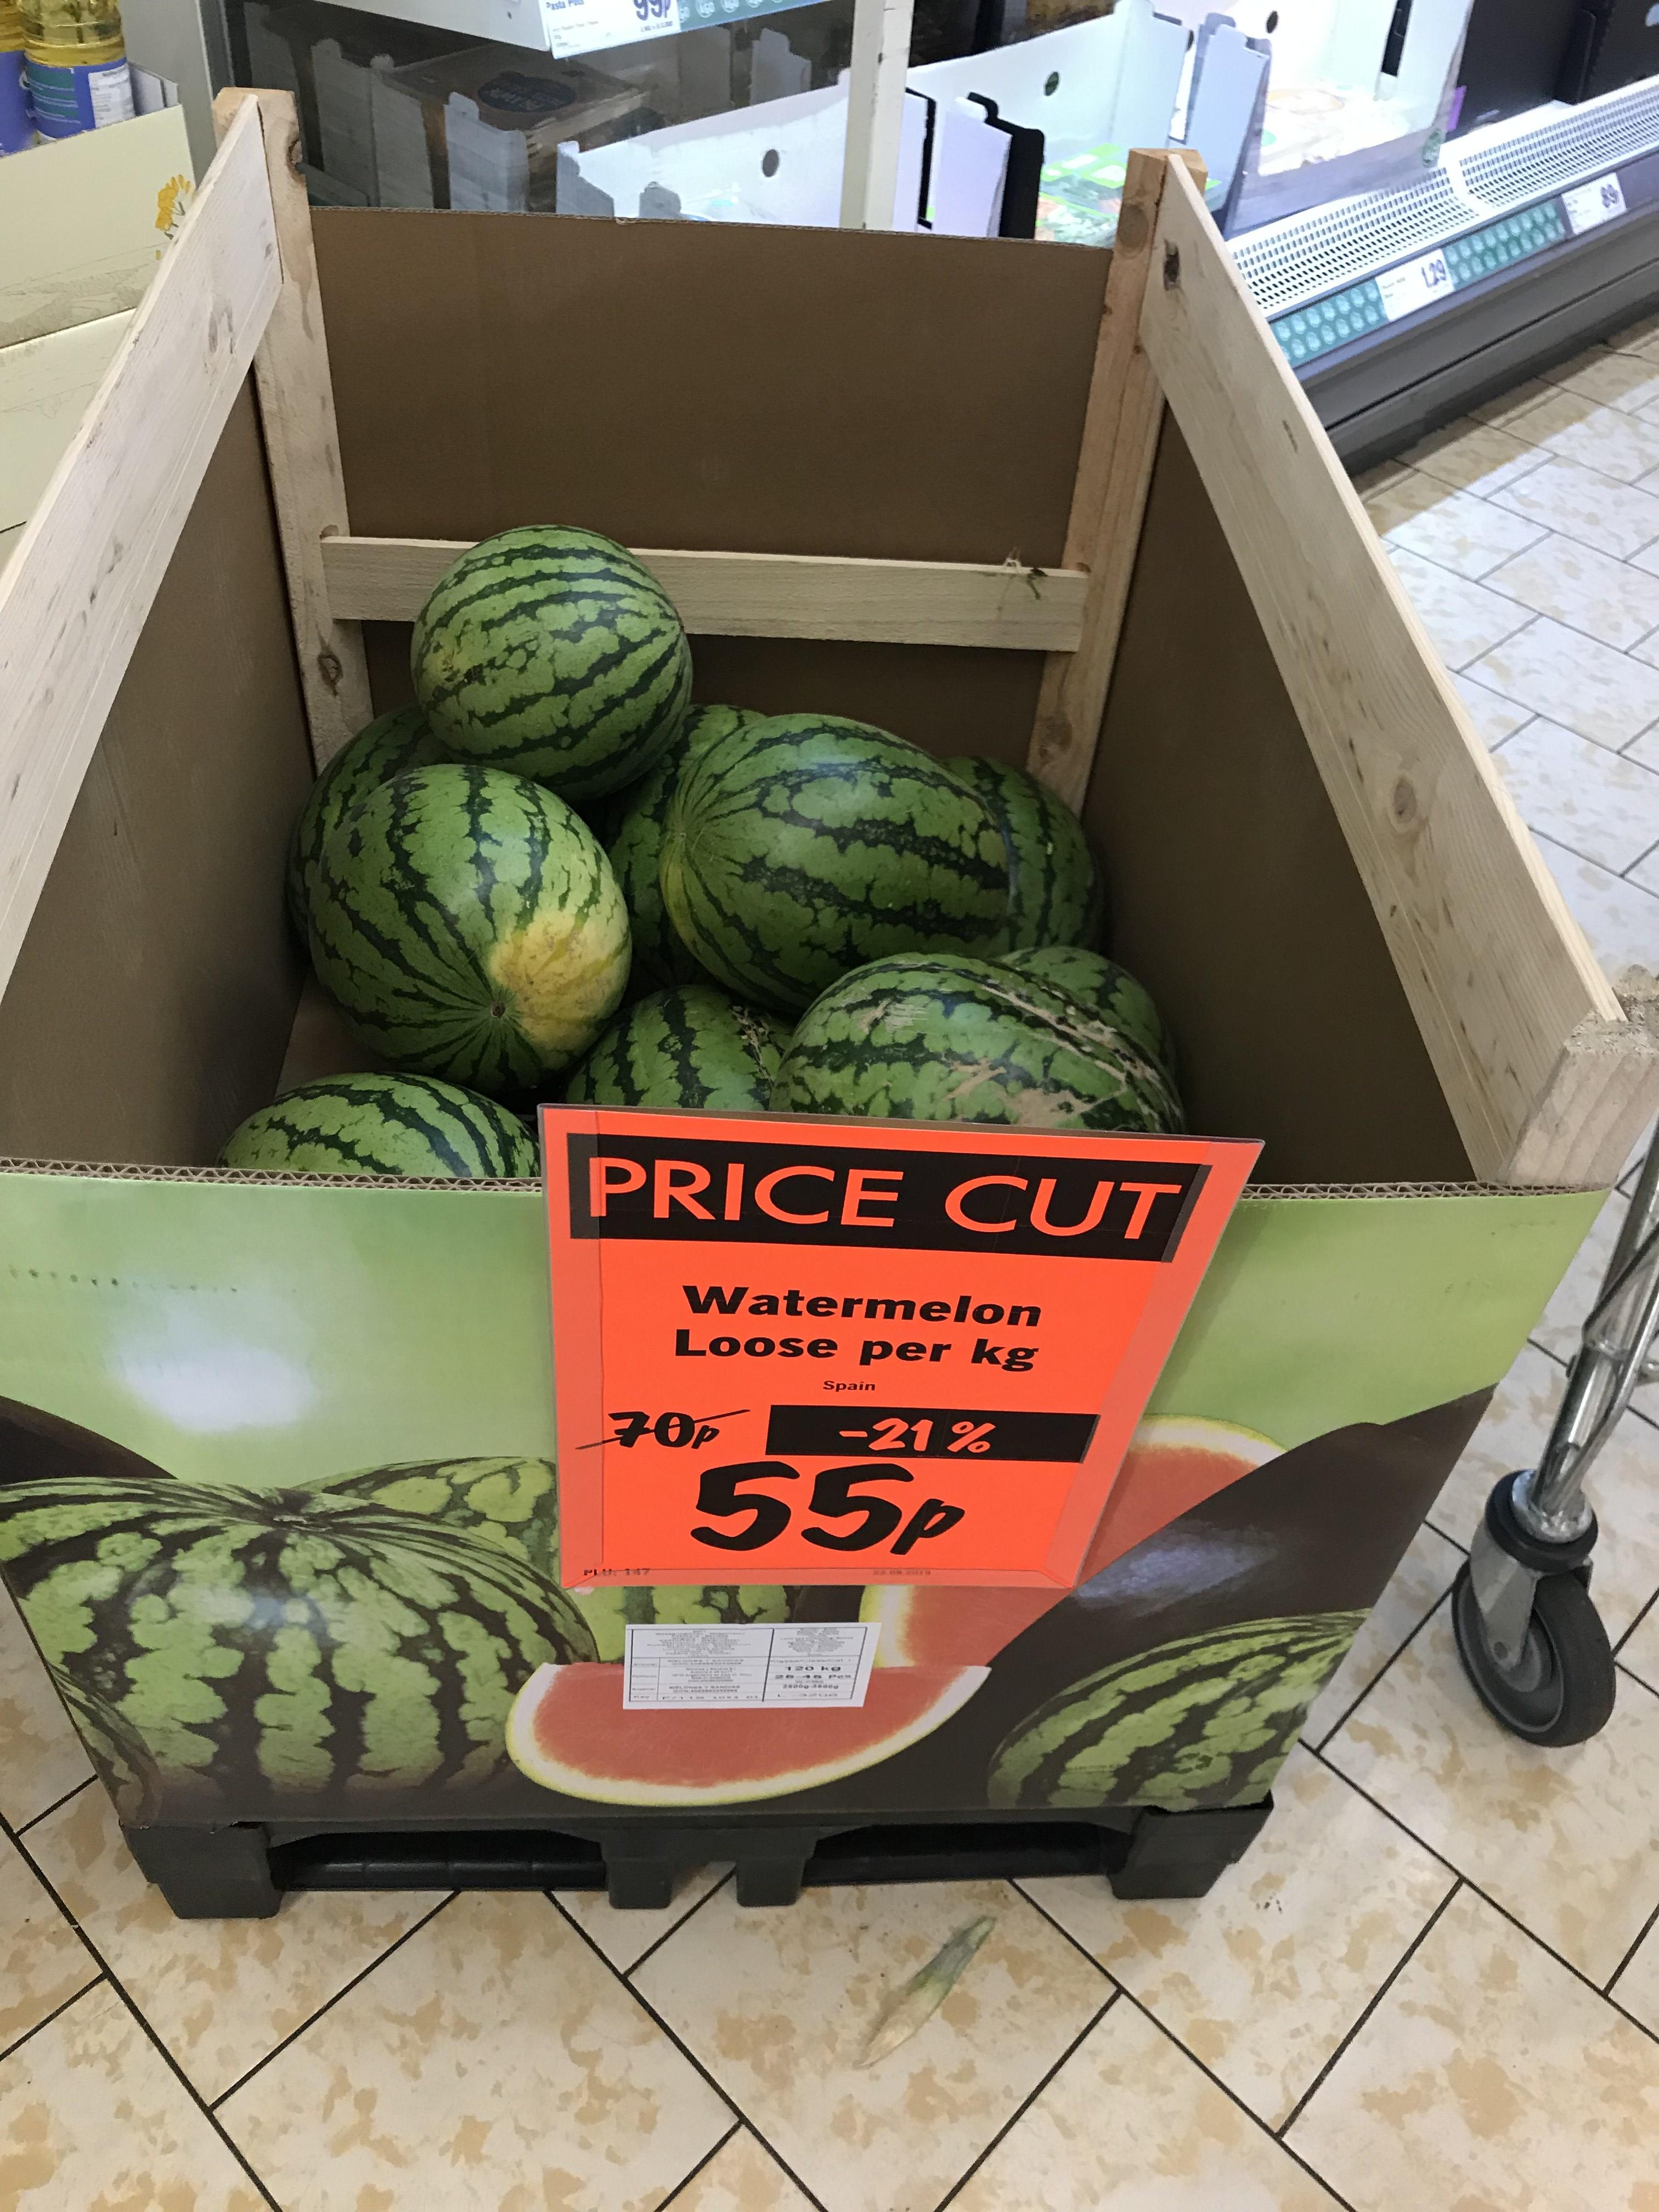 Watermelons 55p per kilo Lidl - 55p